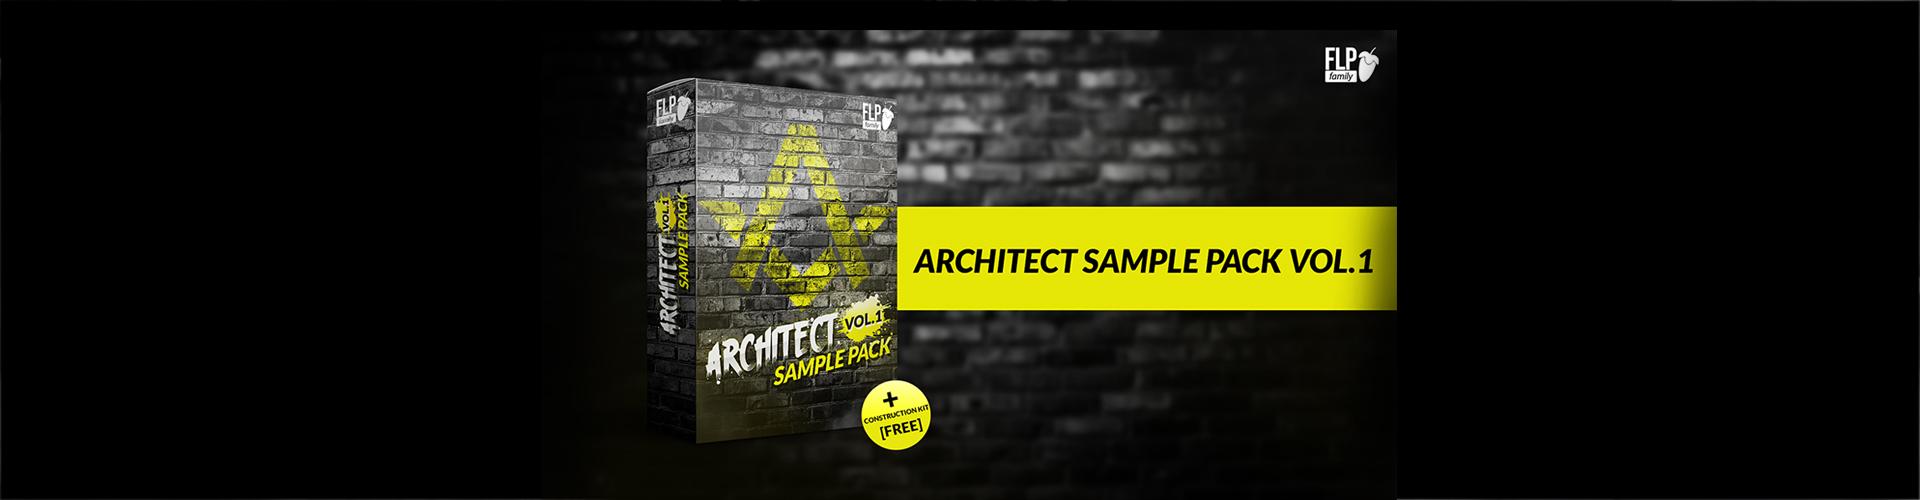 https://dj-architect.com/wp-content/uploads/2017/04/Sample-pack-za-sajt.jpg